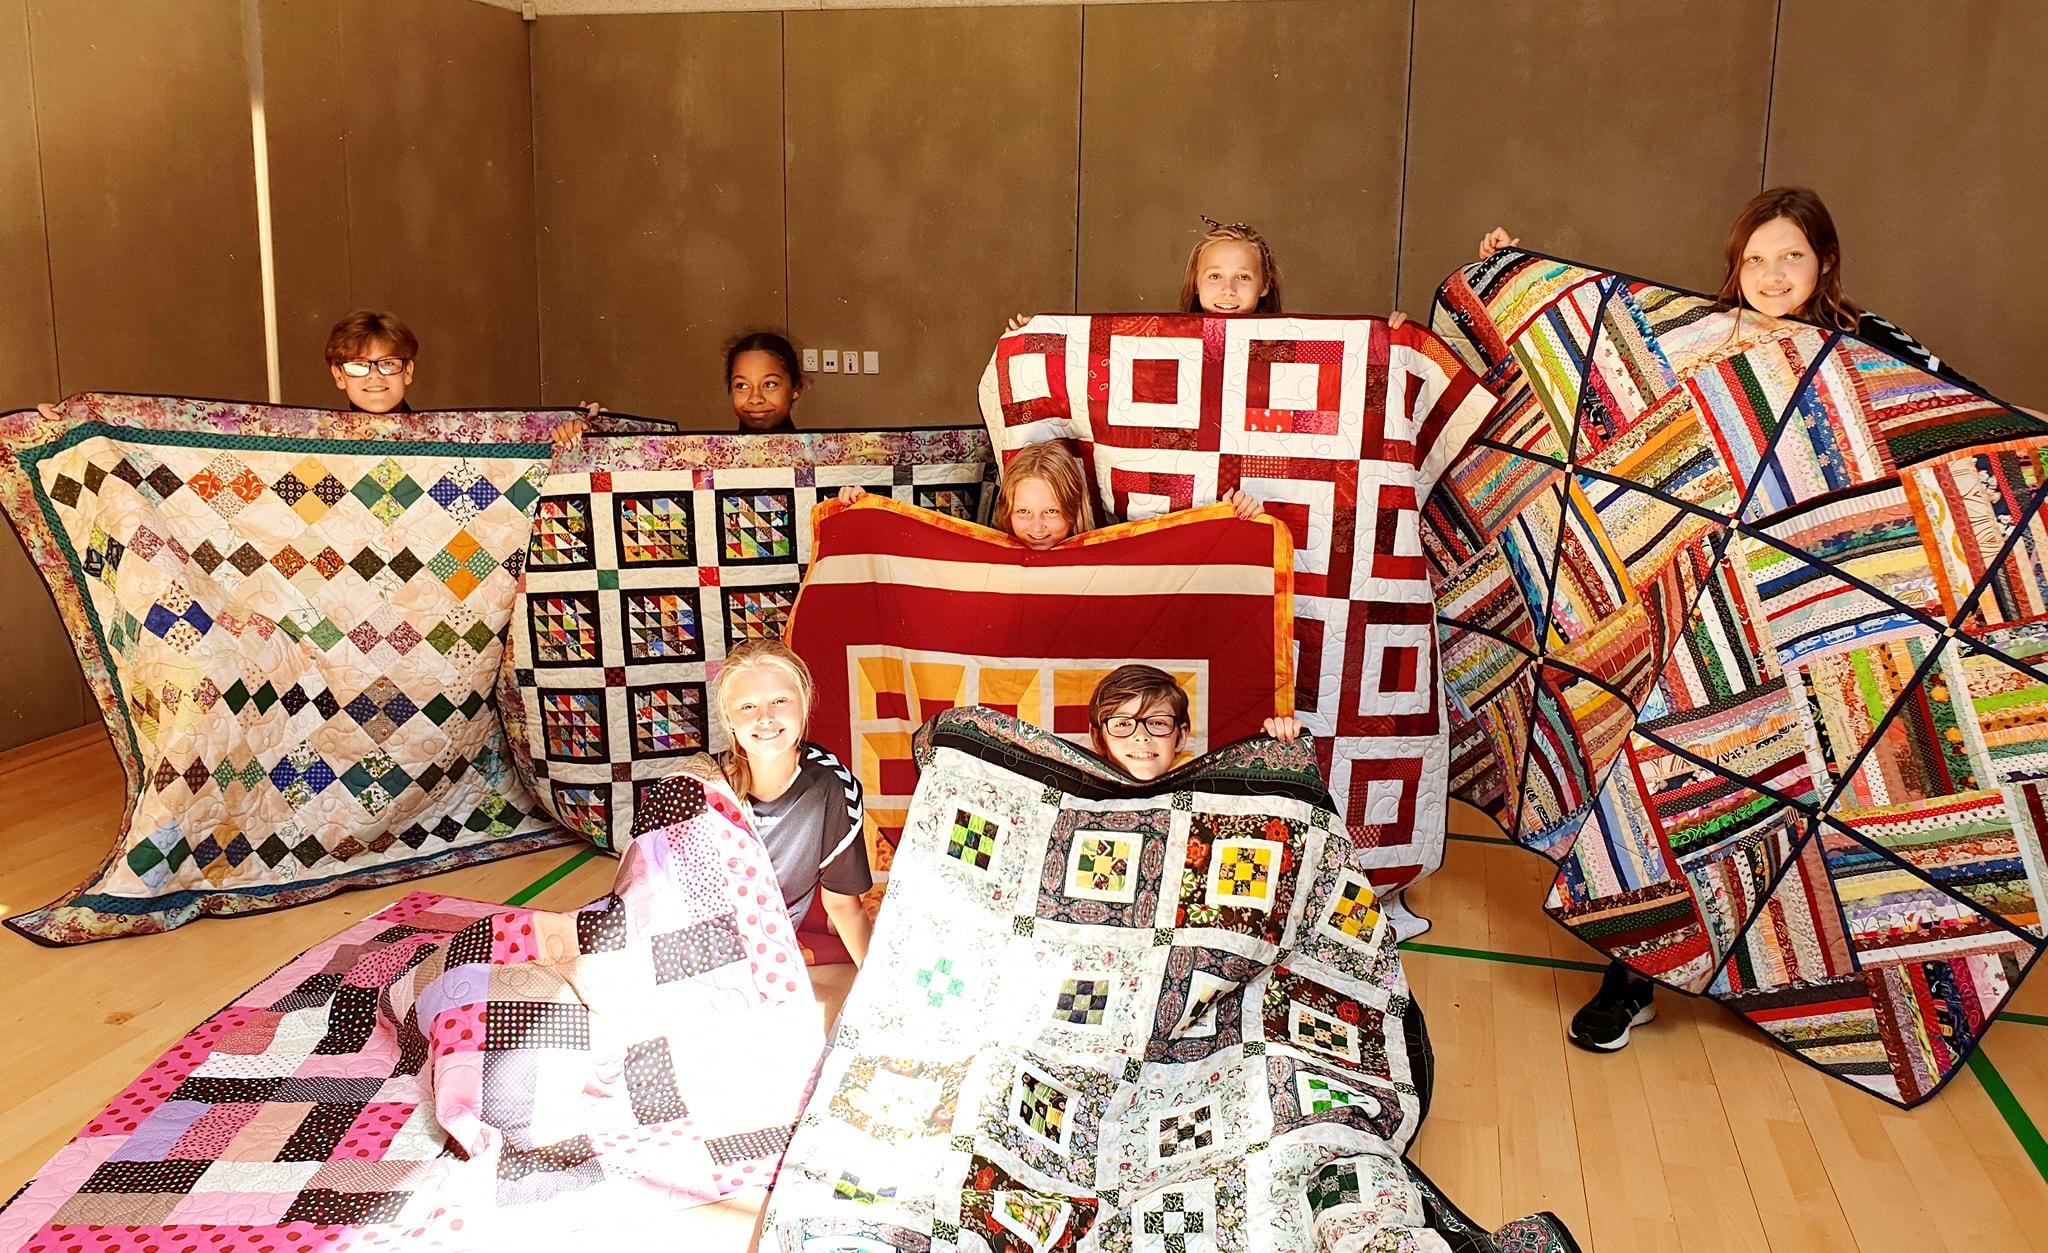 050619 kildemose børn og tæpper